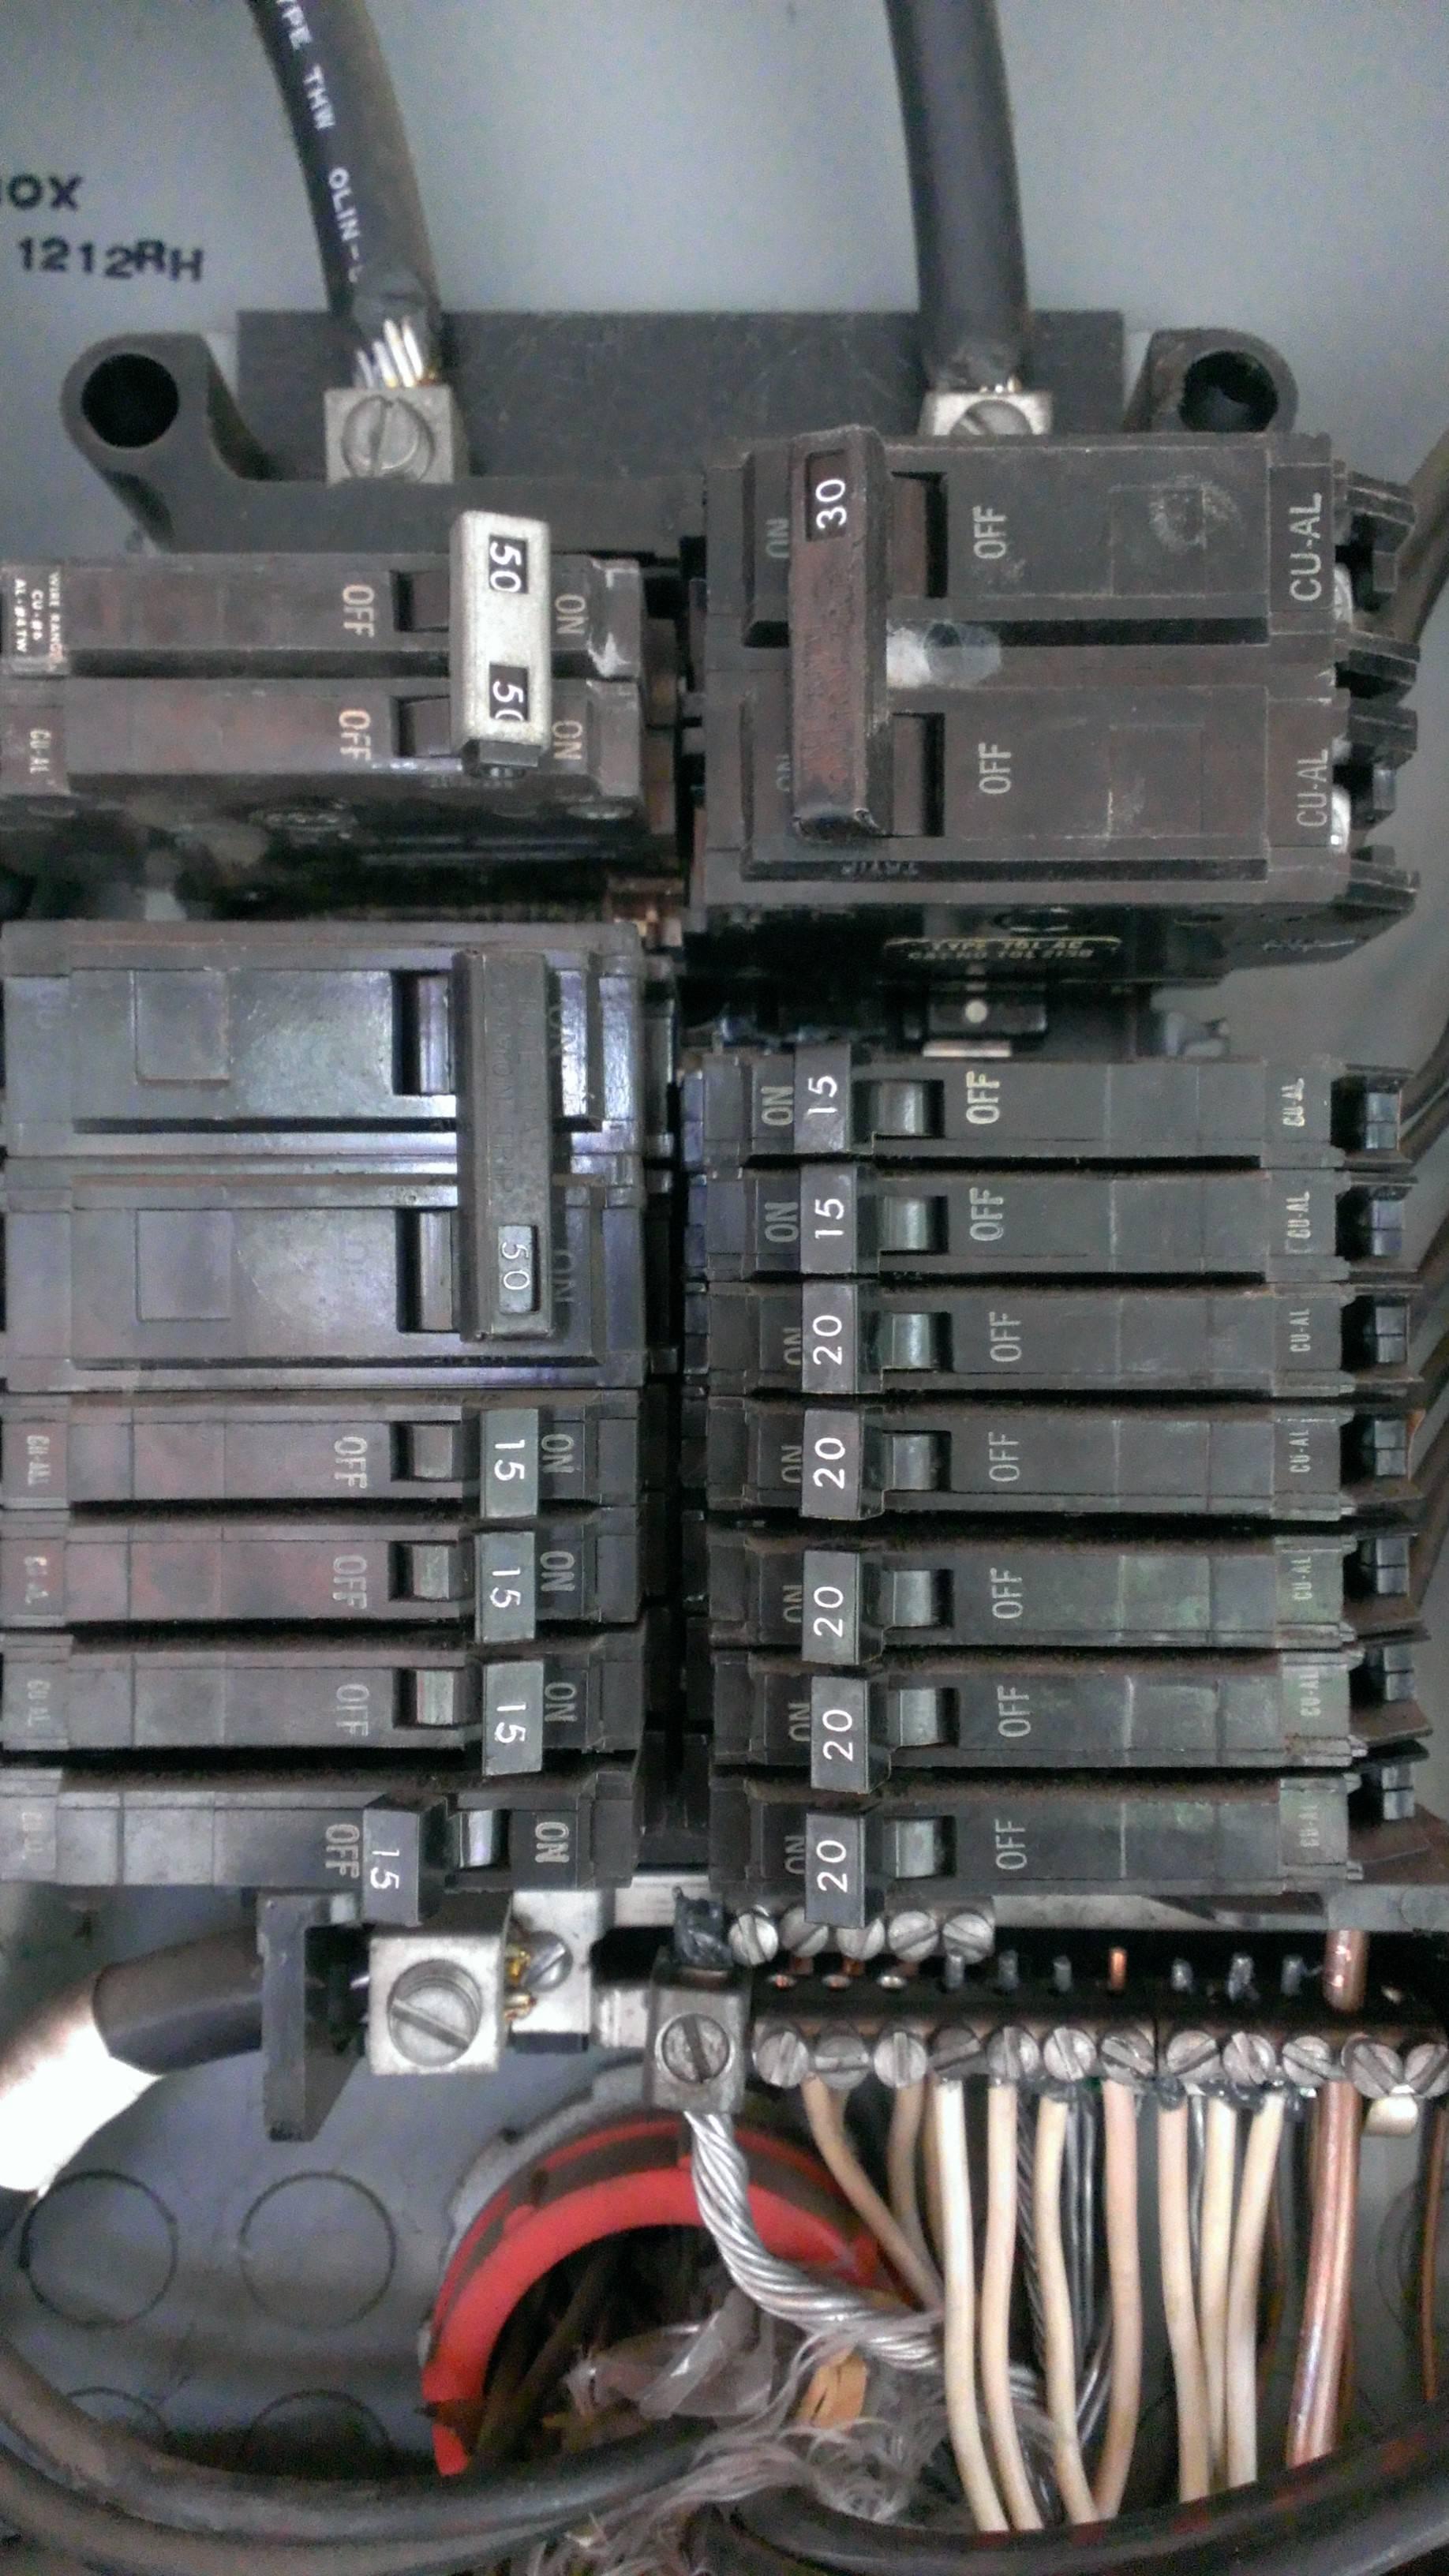 Stupendous 150 Amp Meter Box Wiring Diagram Get Free Image About Wiring Diagram Wiring Cloud Grayisramohammedshrineorg